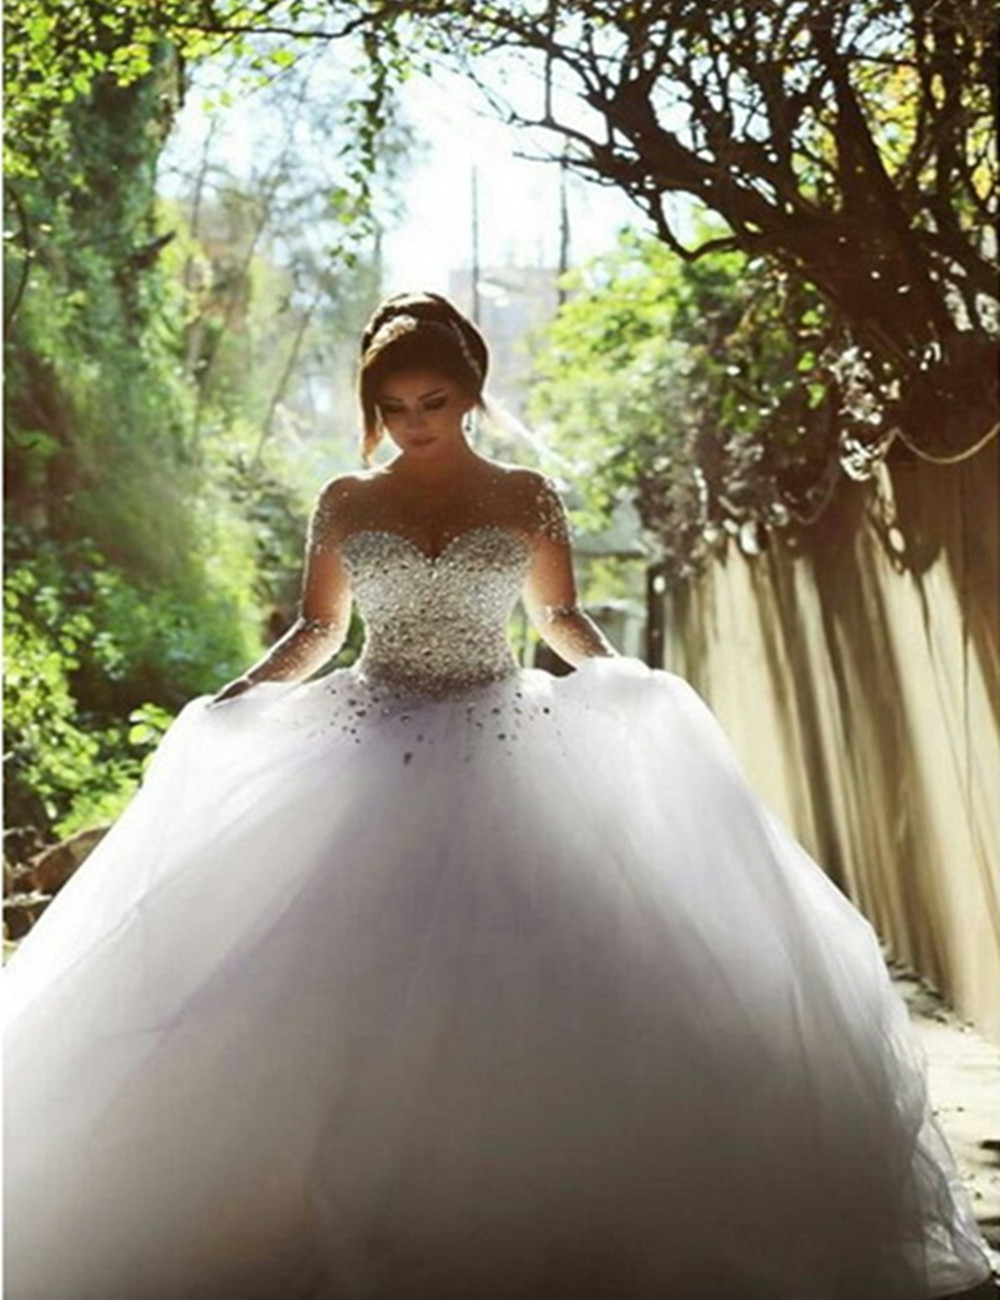 Wedding Dress 2016 Vestido De Noiva Long Sleeve Bridal Gown Rhinestones Pearls Crystals Ball Gown Robe